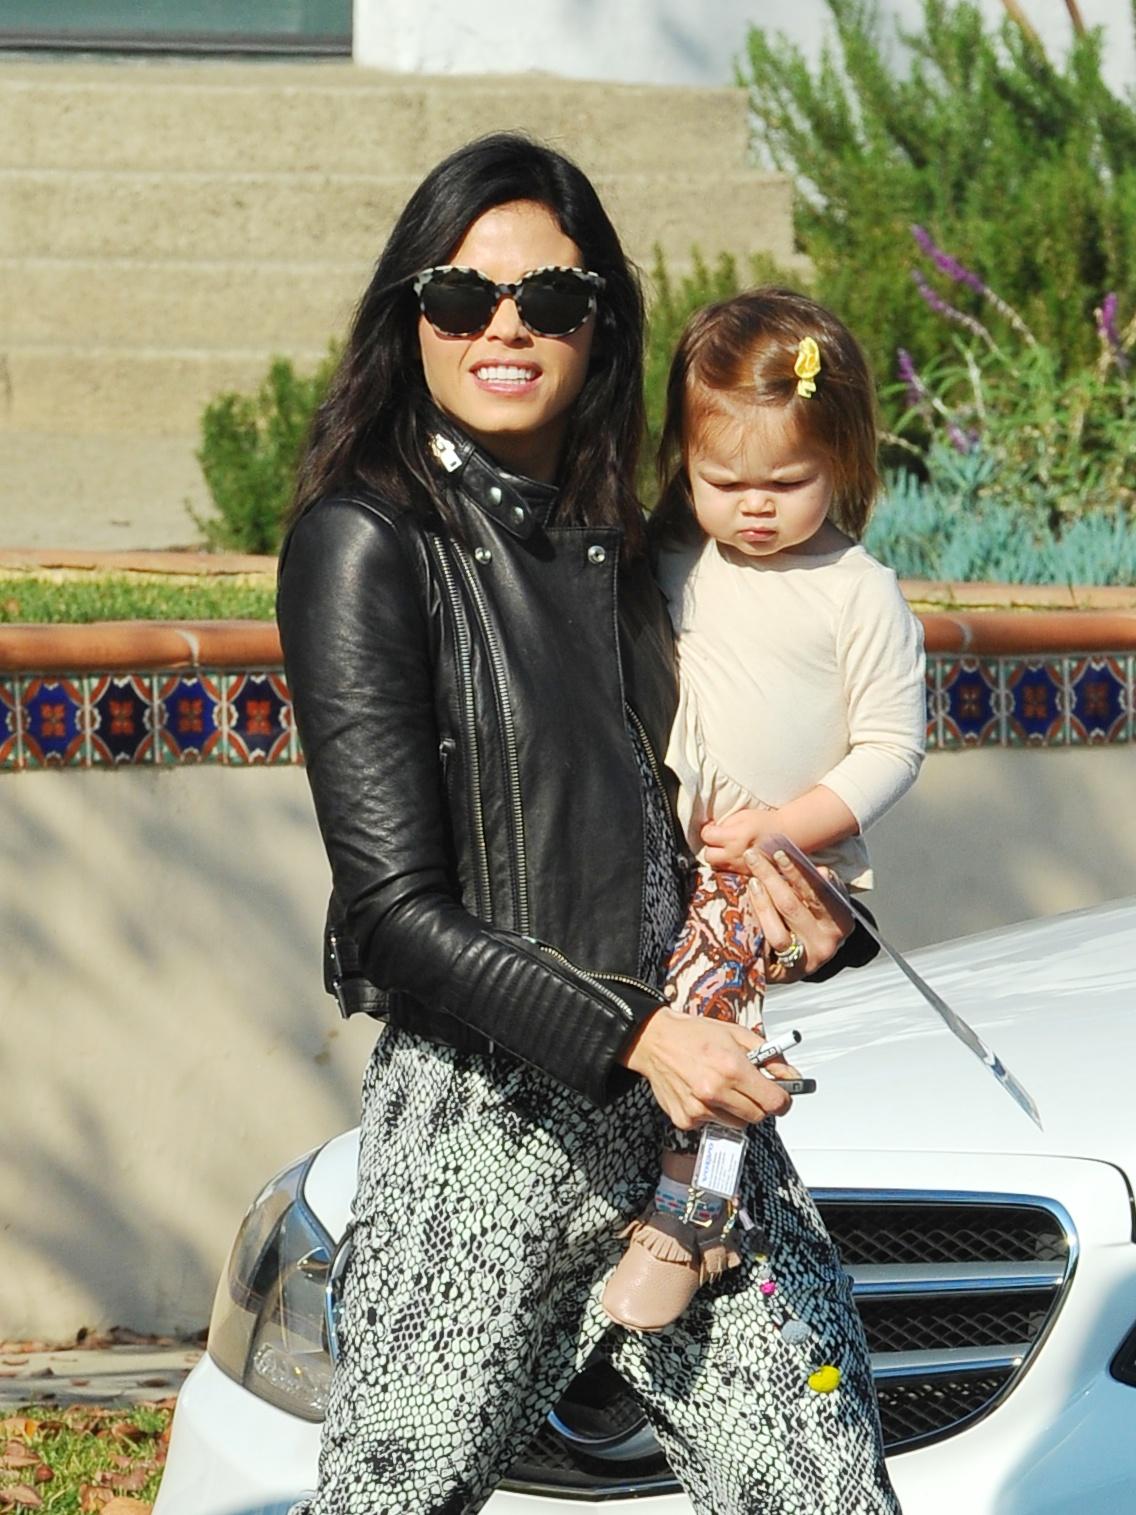 Jenna Dewan Tatum Takes Daughter Everly To A Playdate